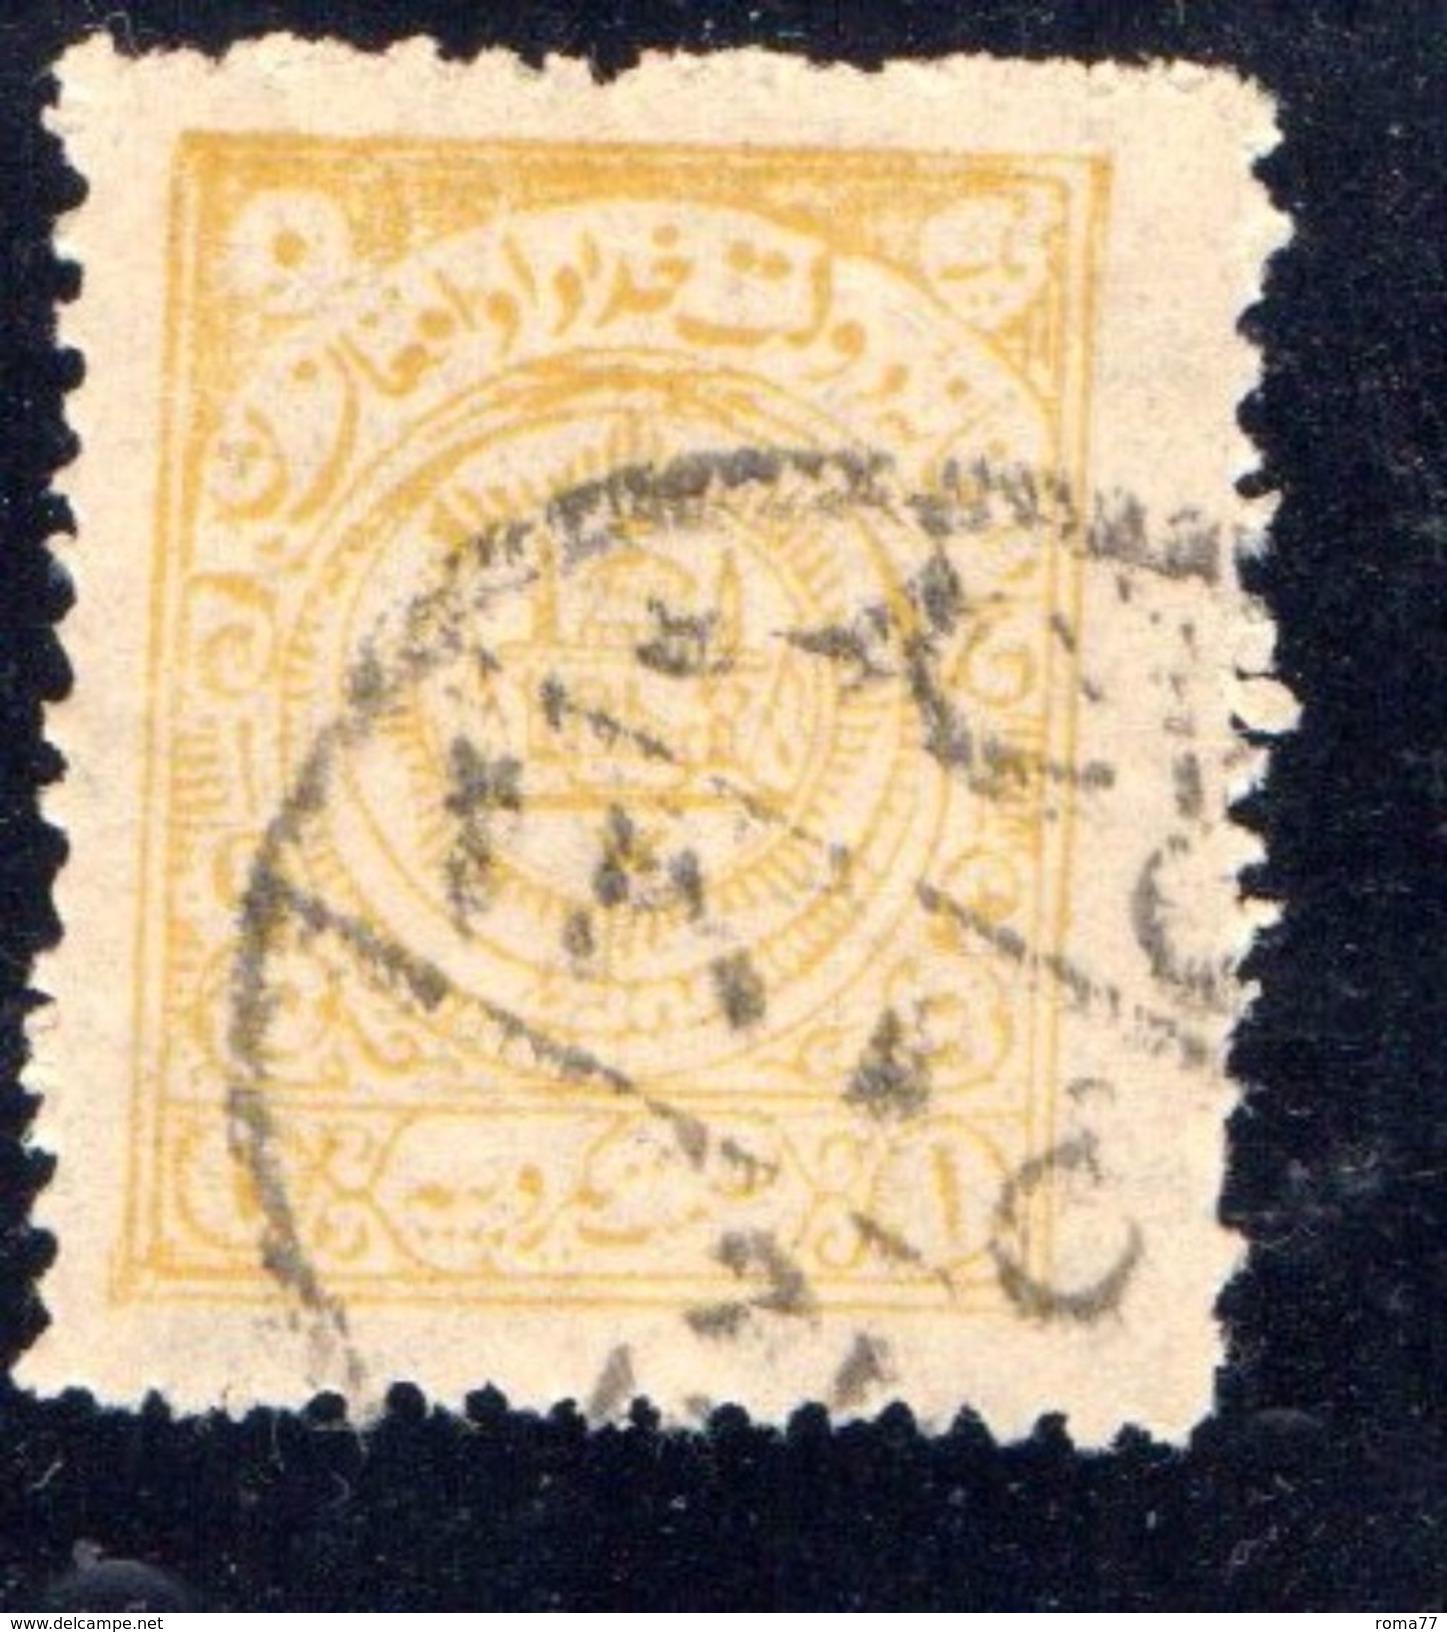 XP2883 - AFGANISTAN , 1 Valore Giallo Oliva Usato . - Afghanistan